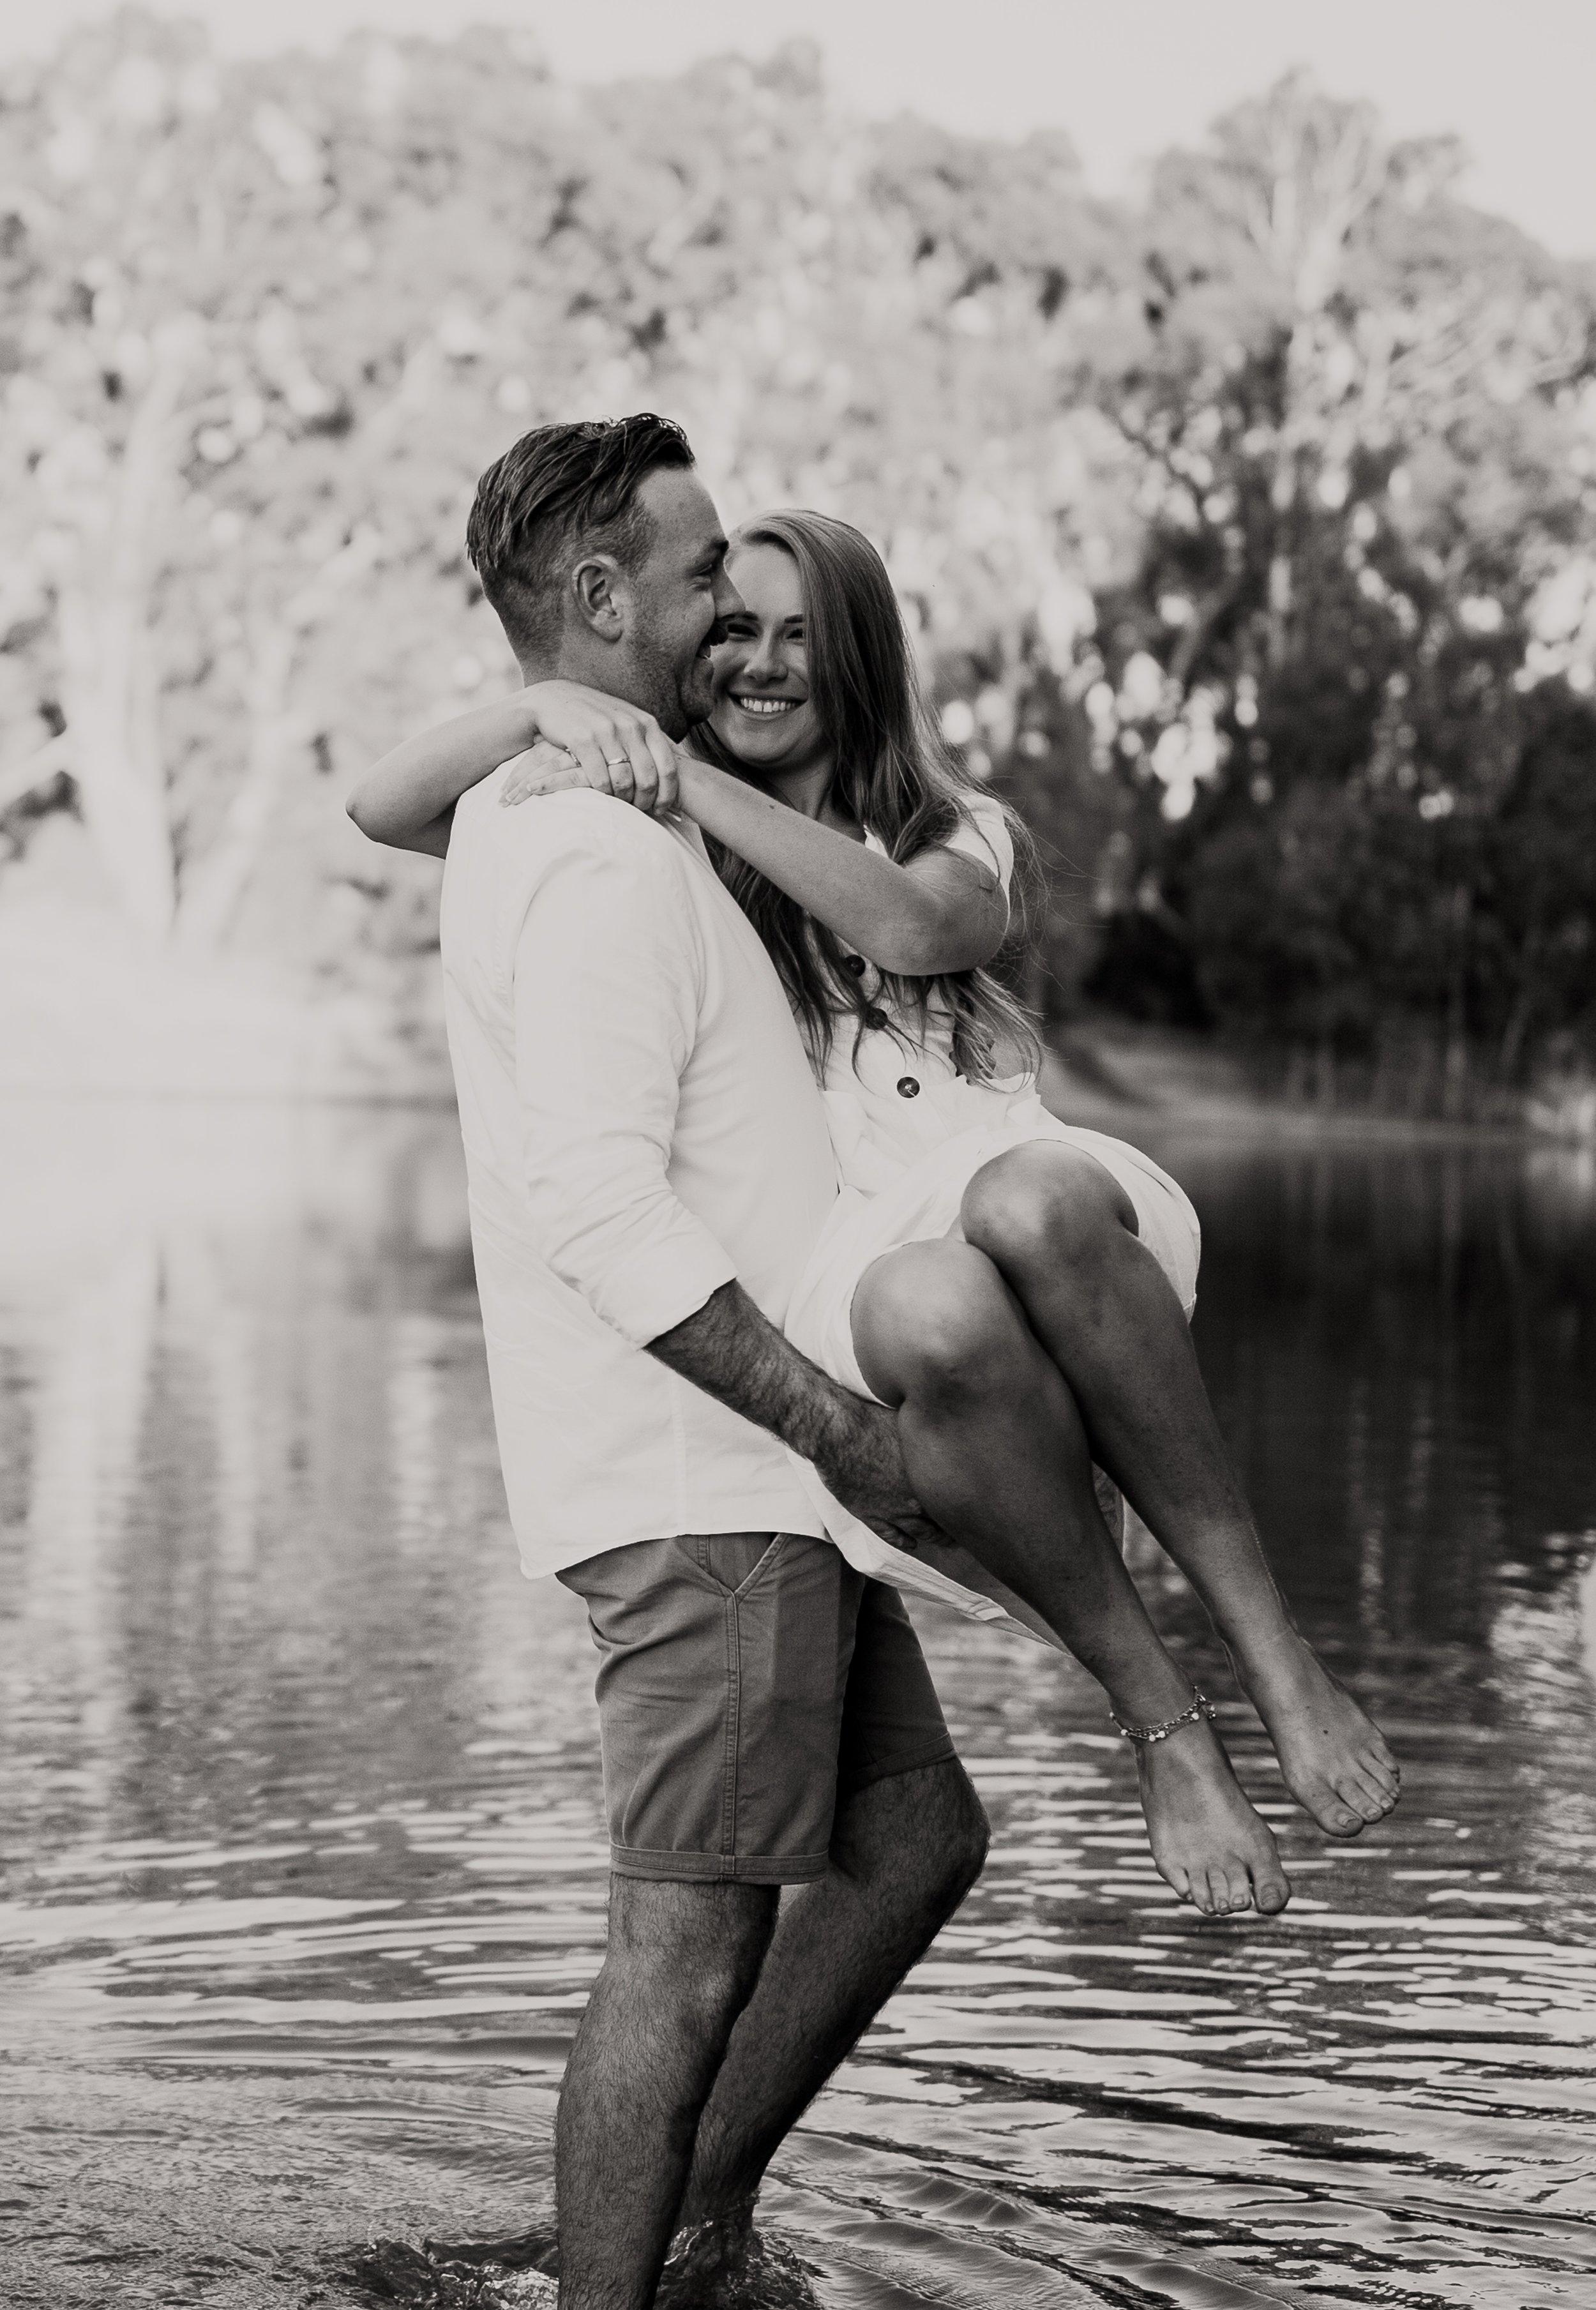 mickalathomas_puremacphotography_weddingphotographer_couplephotographer_Sheppartonphotographer_2837.jpg